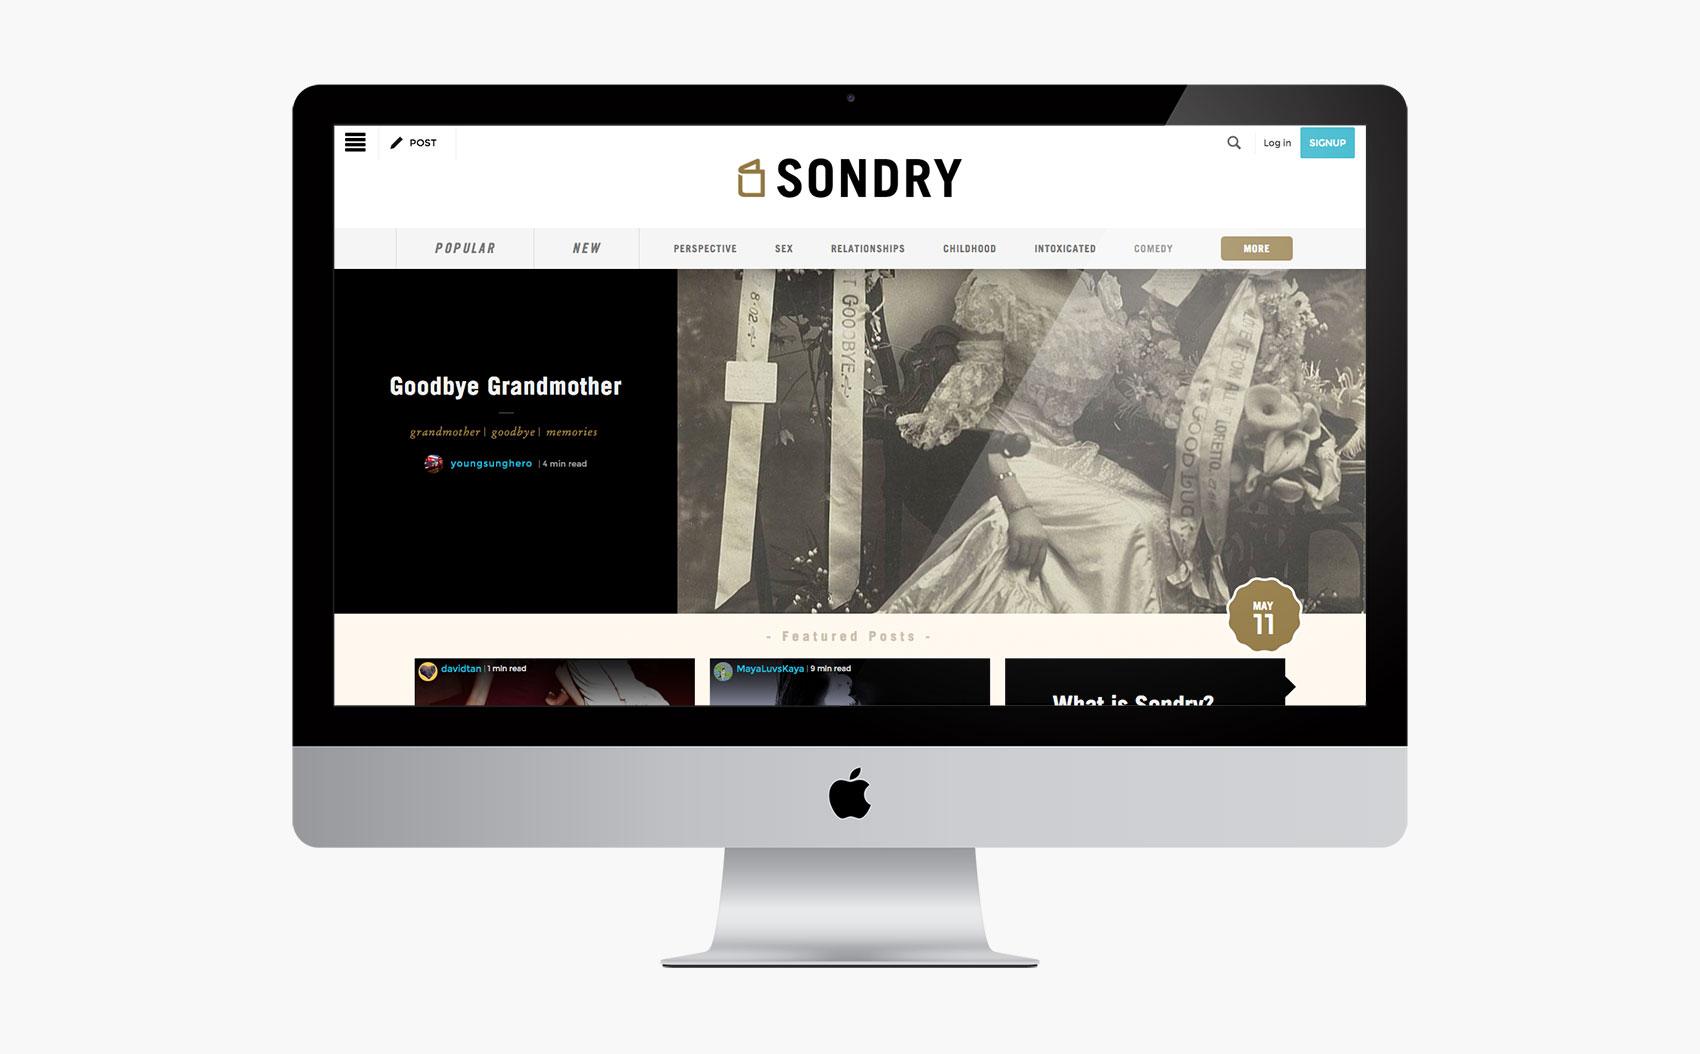 Sondry Home Page